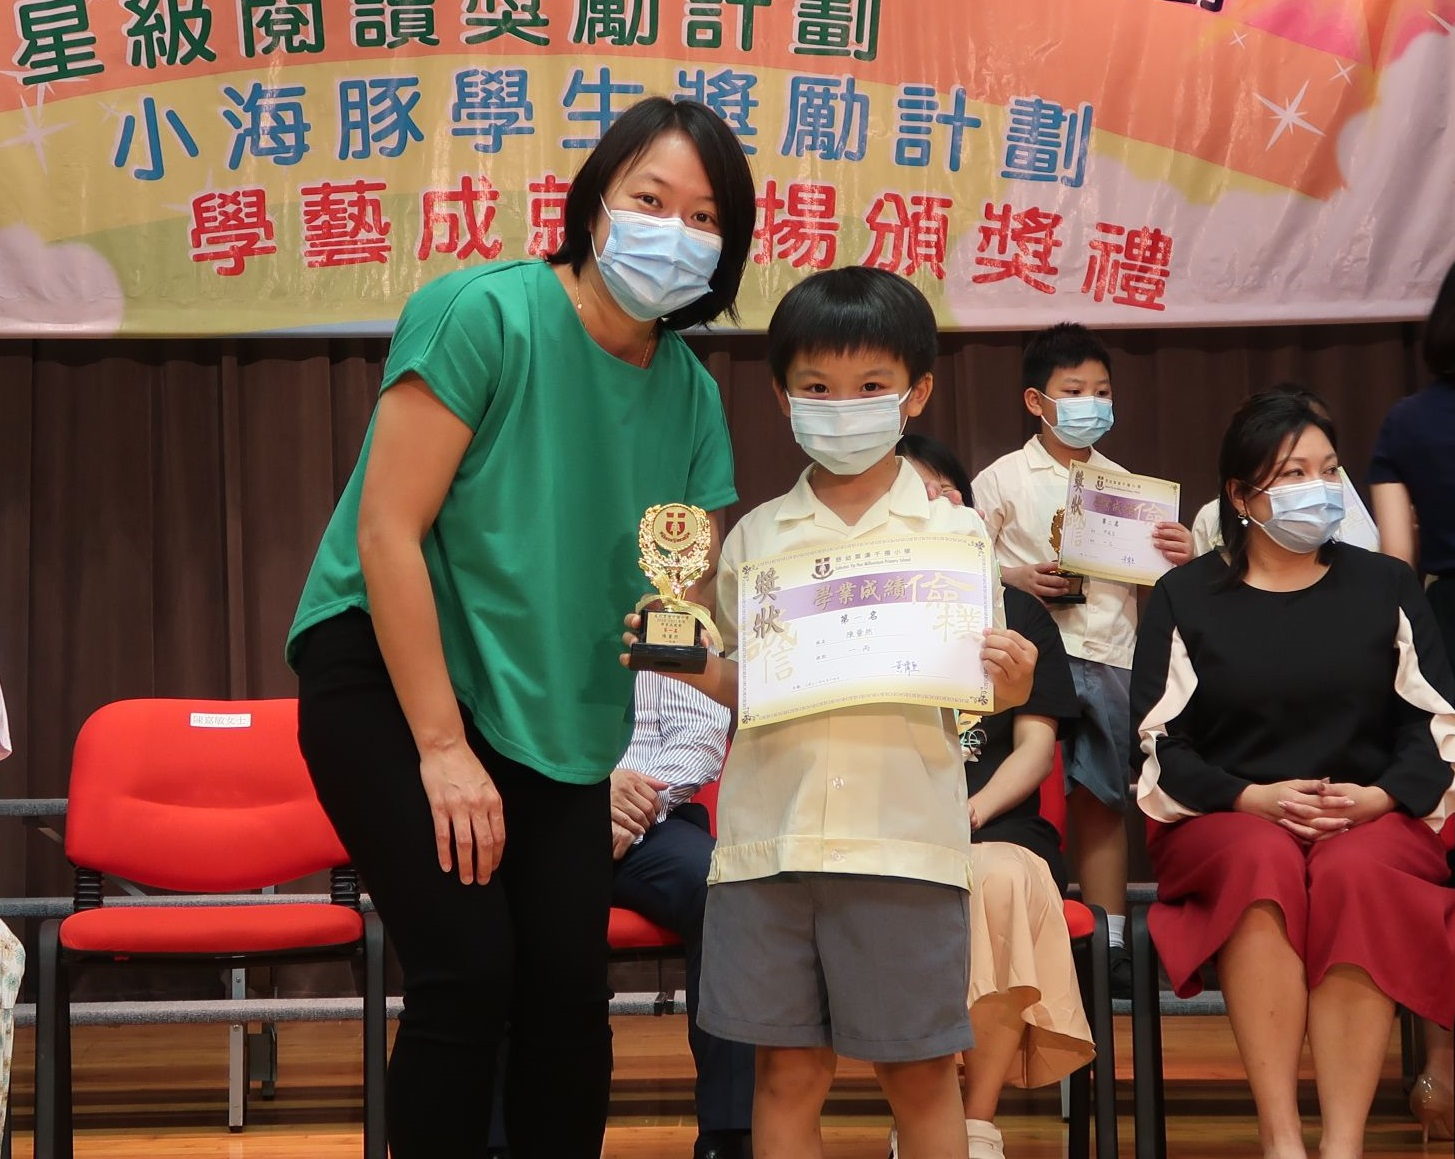 https://syh.edu.hk/sites/default/files/img_5377.jpg